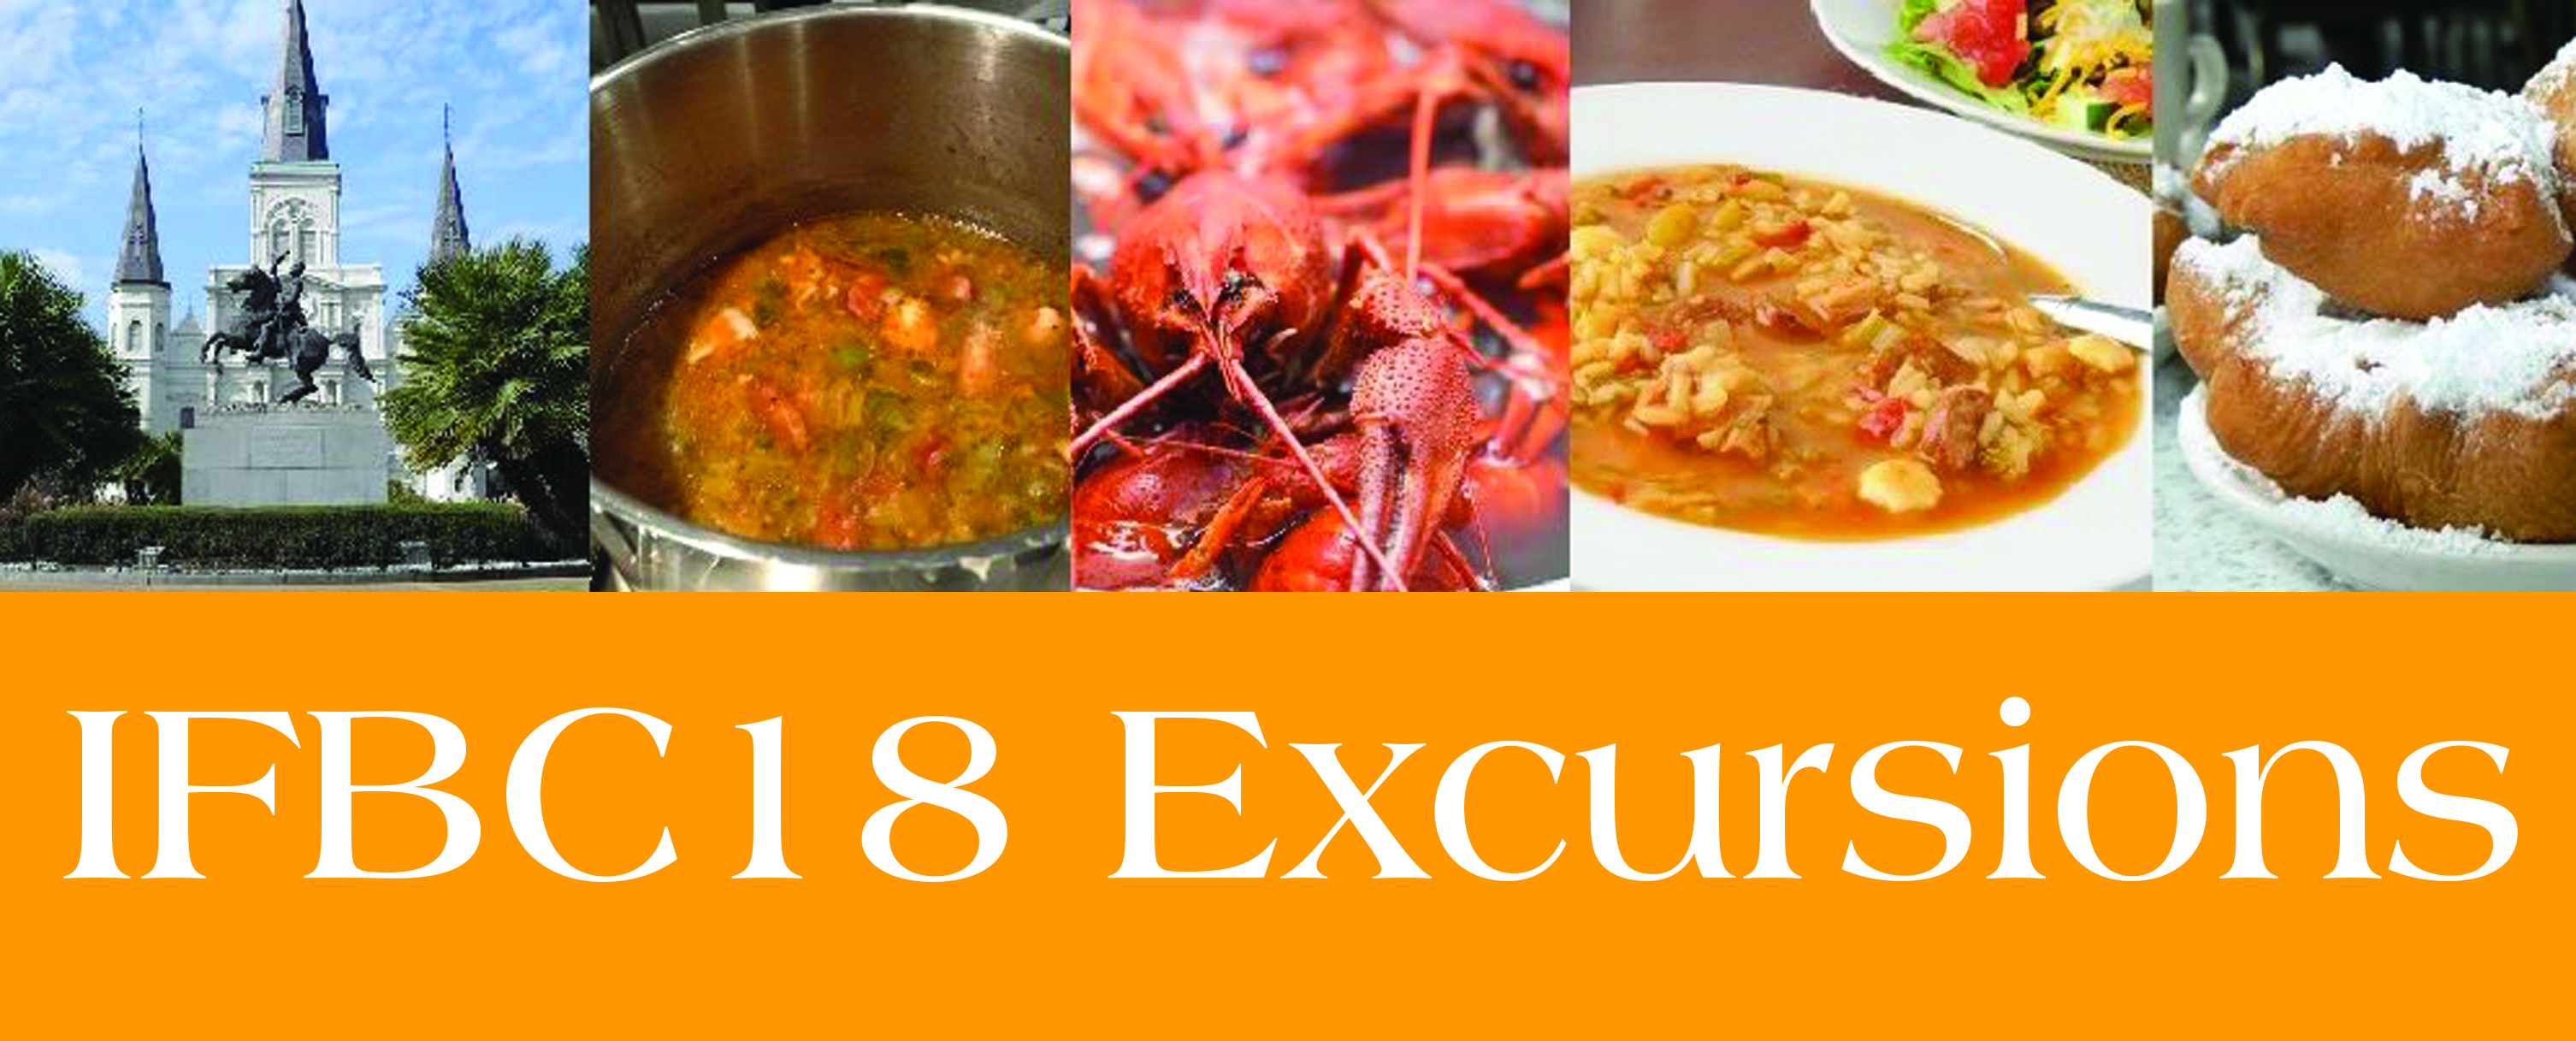 2018 Excursions -